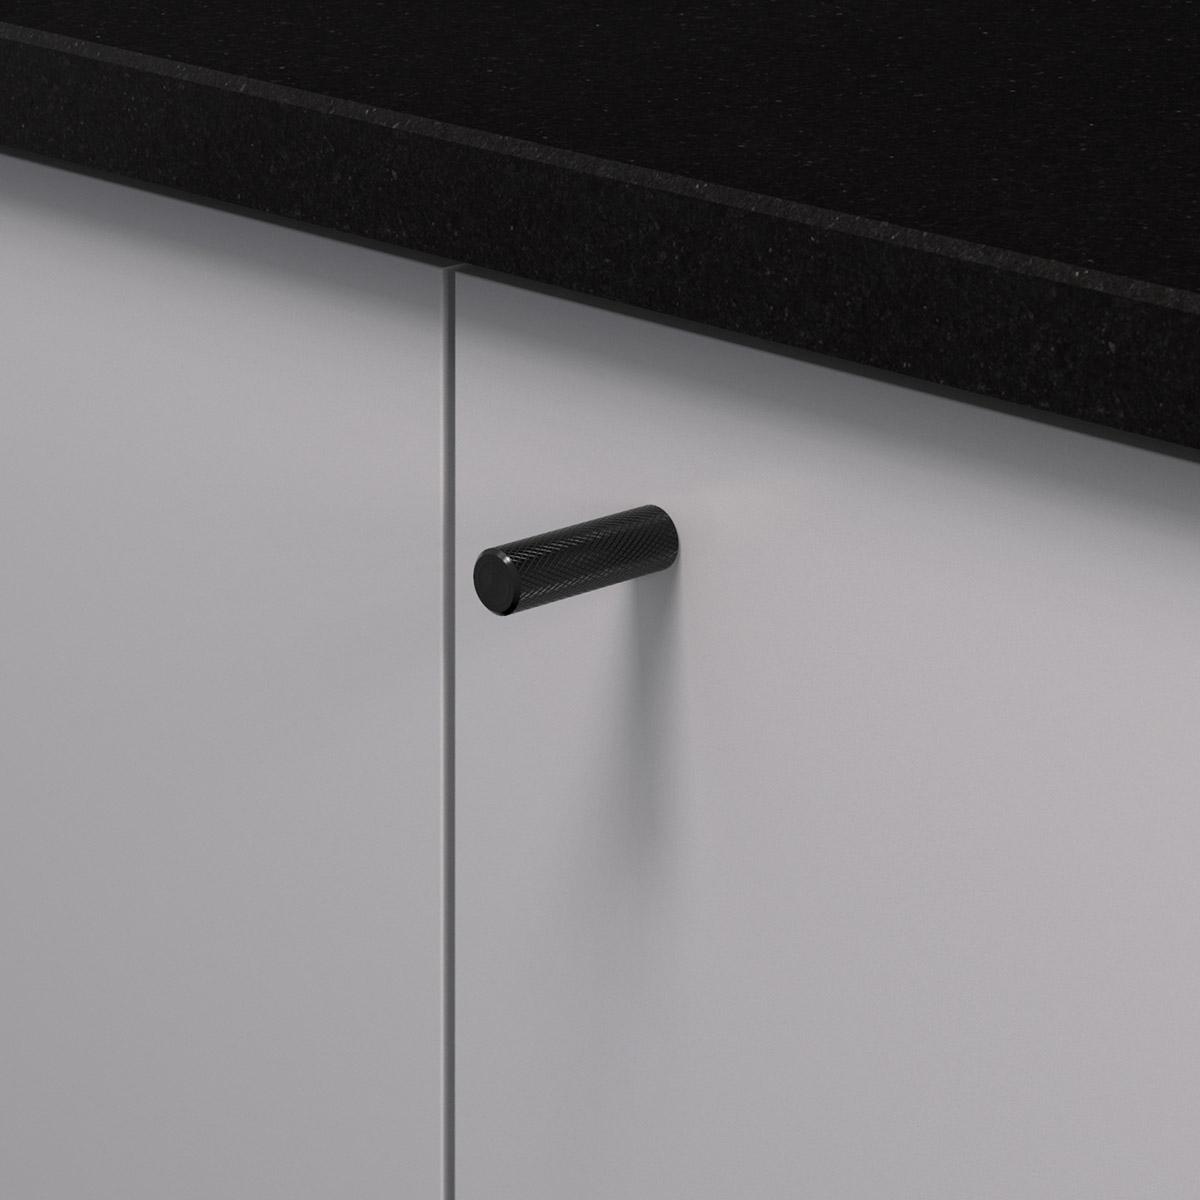 Knopp matt svart 370226 11 10 mm ncs s 4500 n granit svart